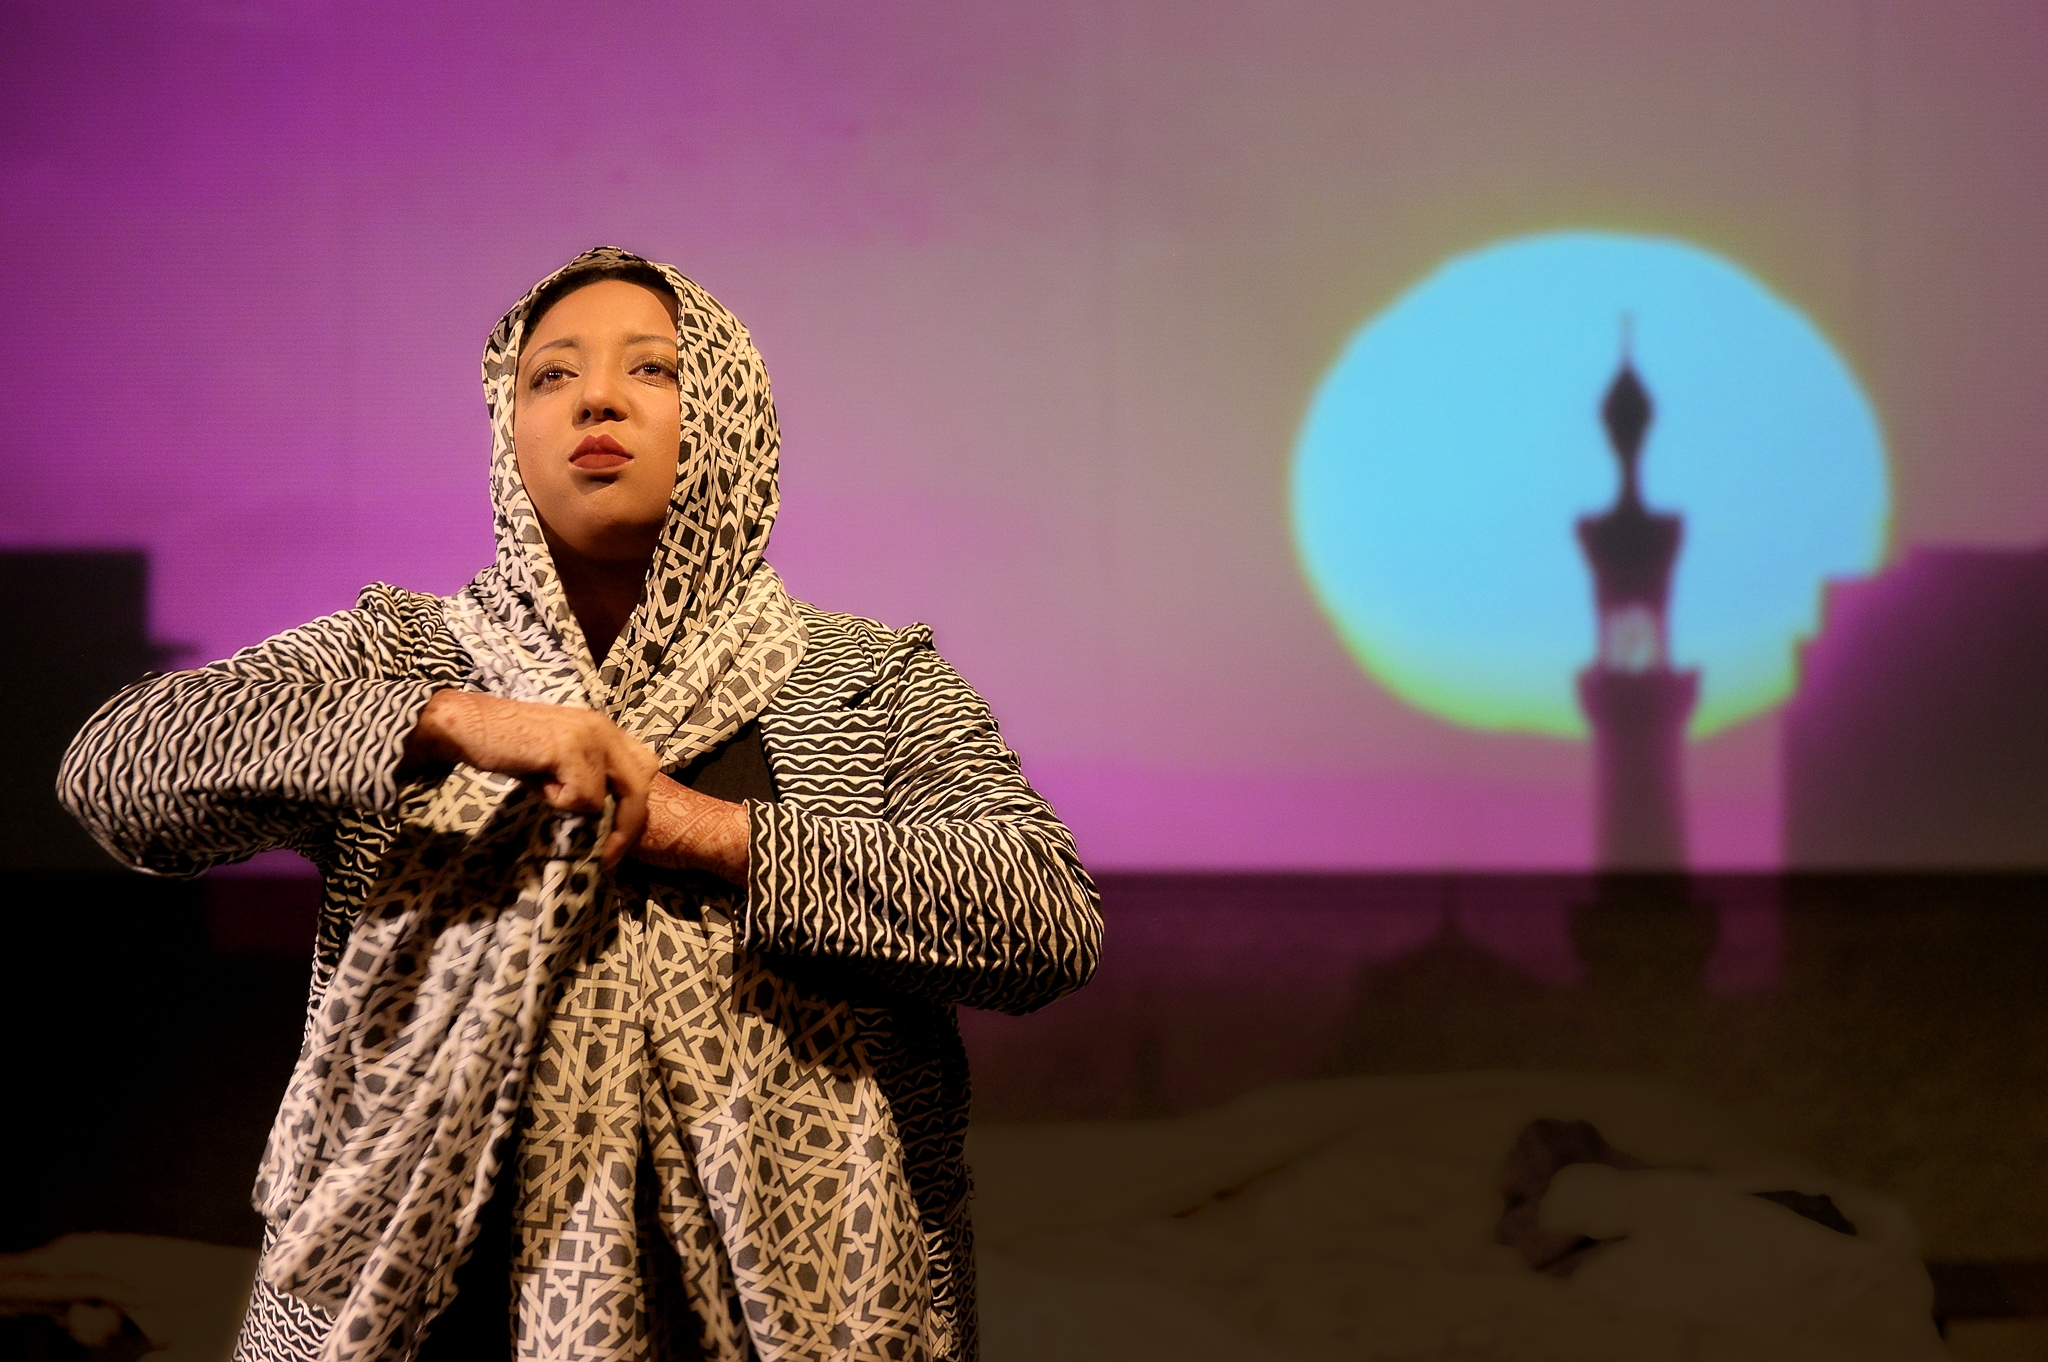 Fathiya Ritter in  Veils  by Tom Coash, directed by Lia Sima Fakhouri. Photo by Joe Iano Photography.